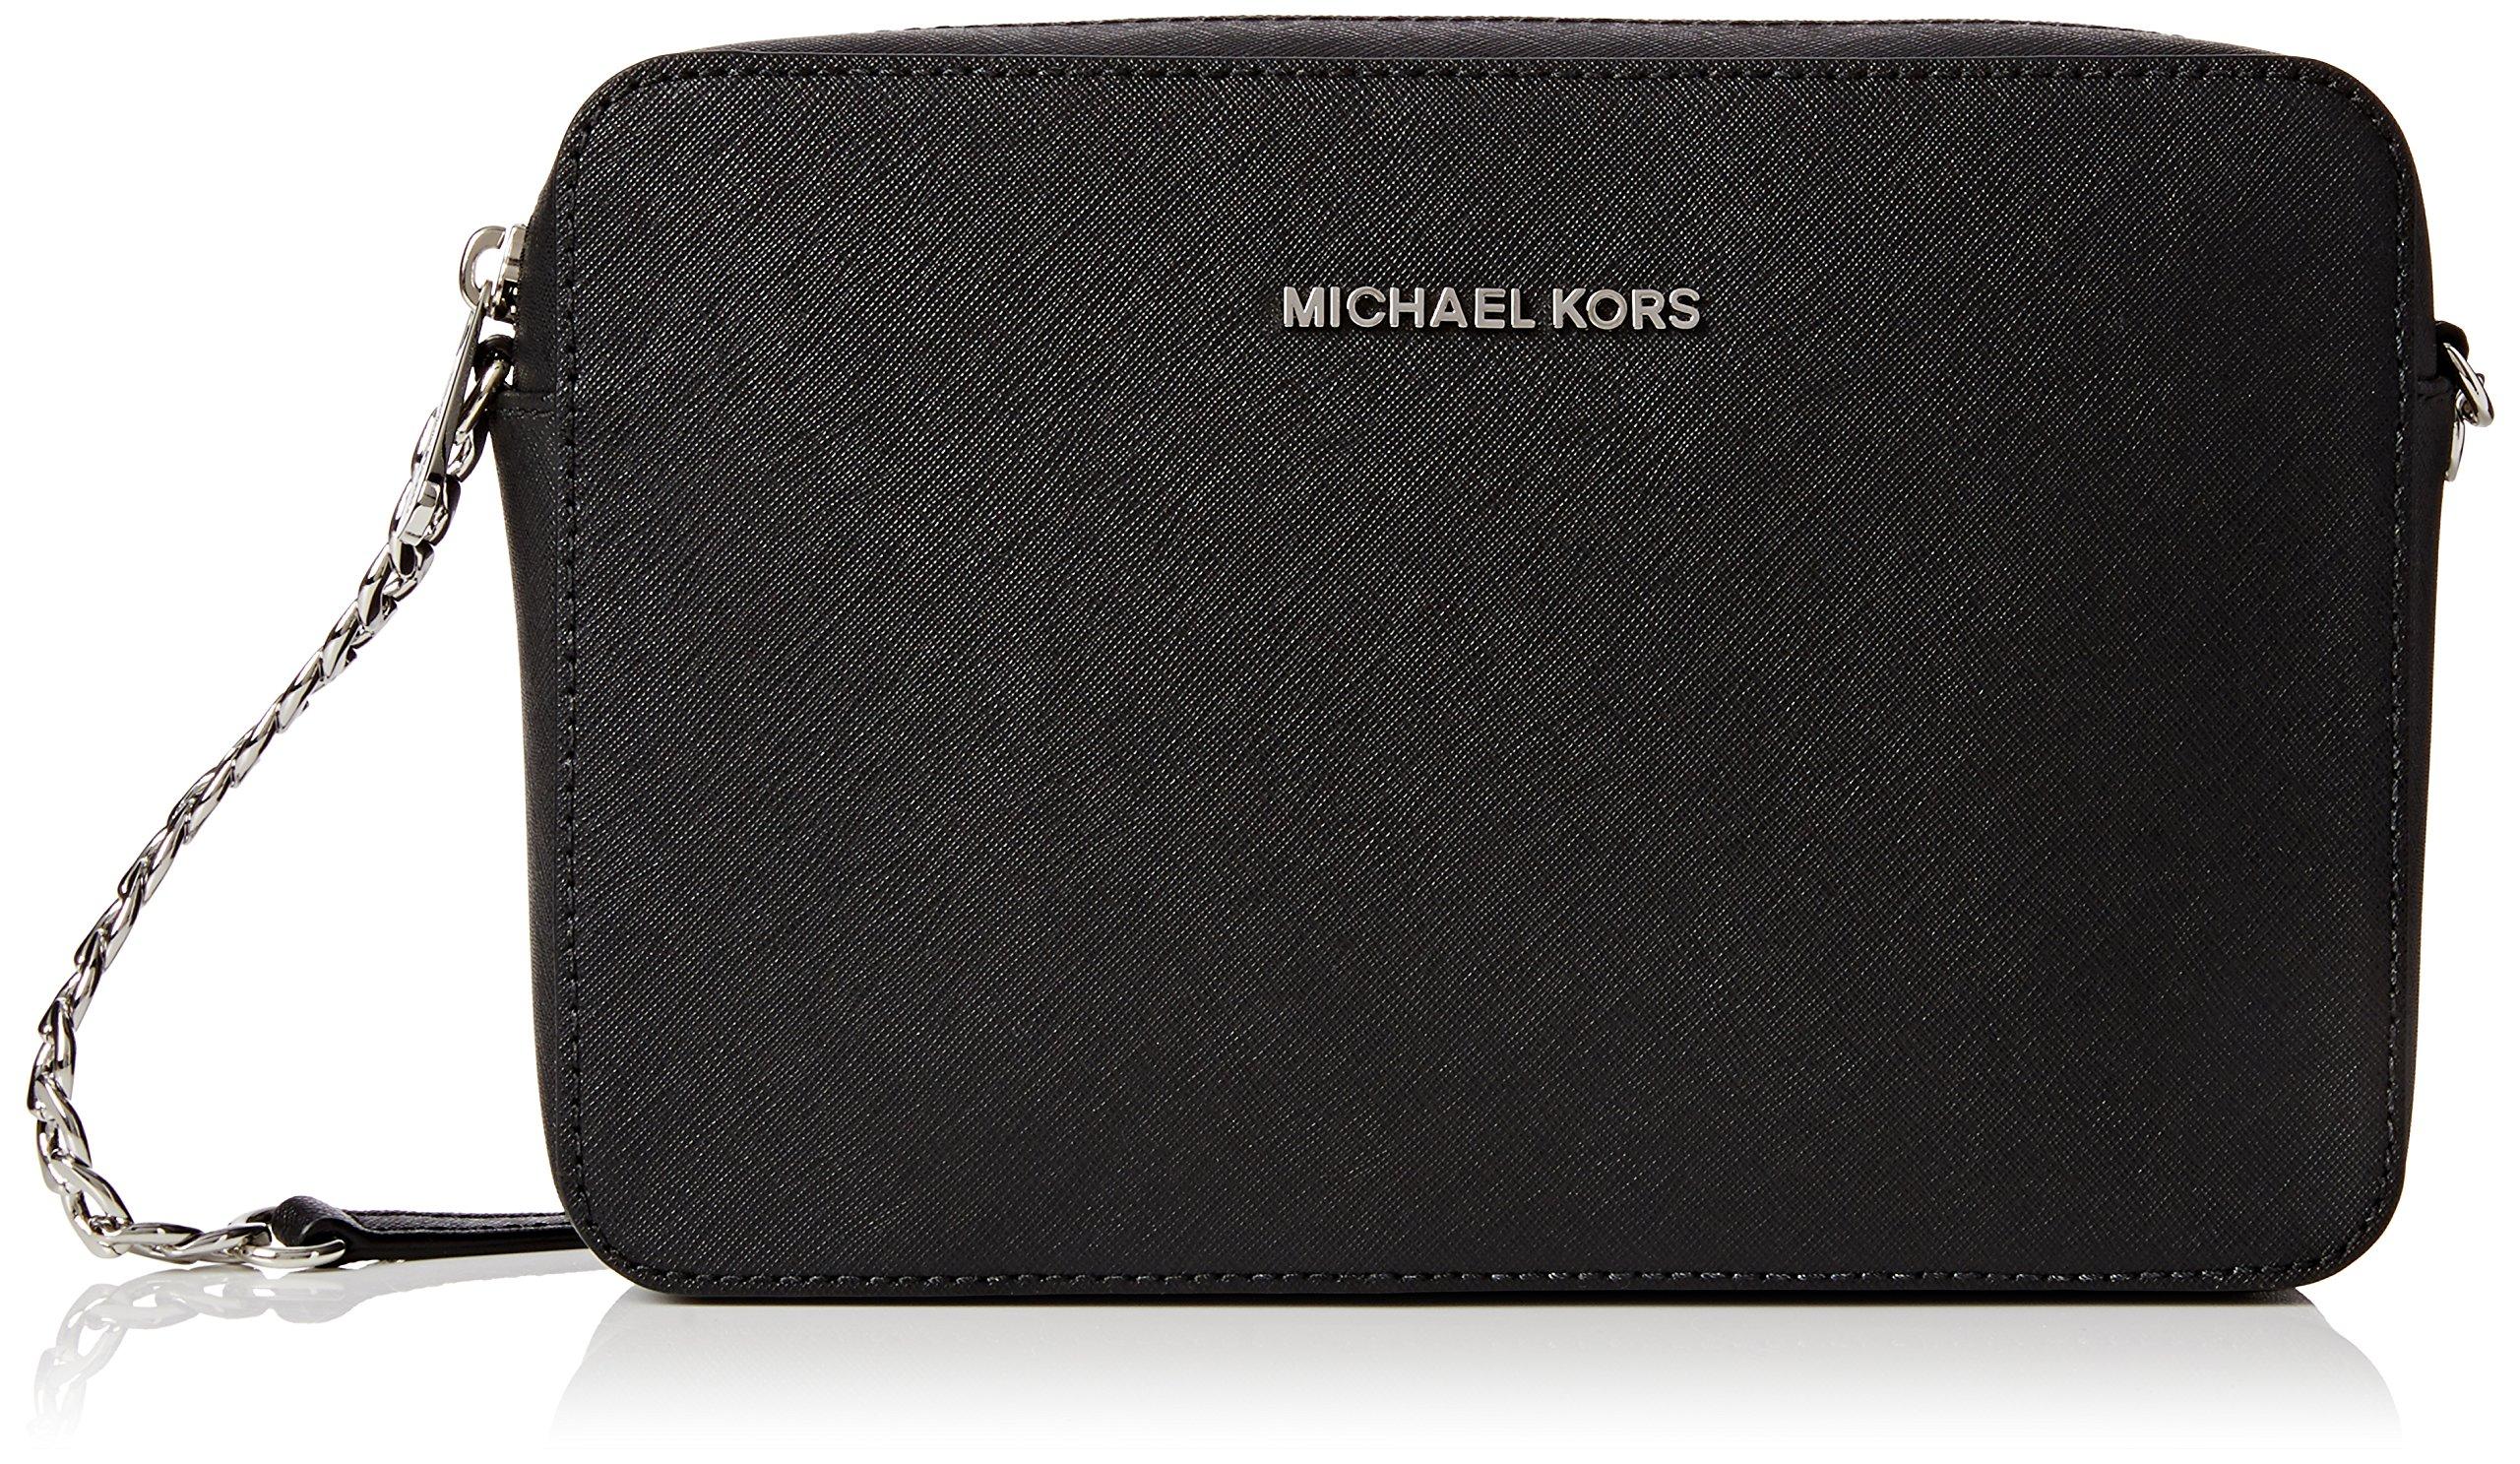 MICHAEL Michael Kors Jet Set Crossbody Bag Black One Size